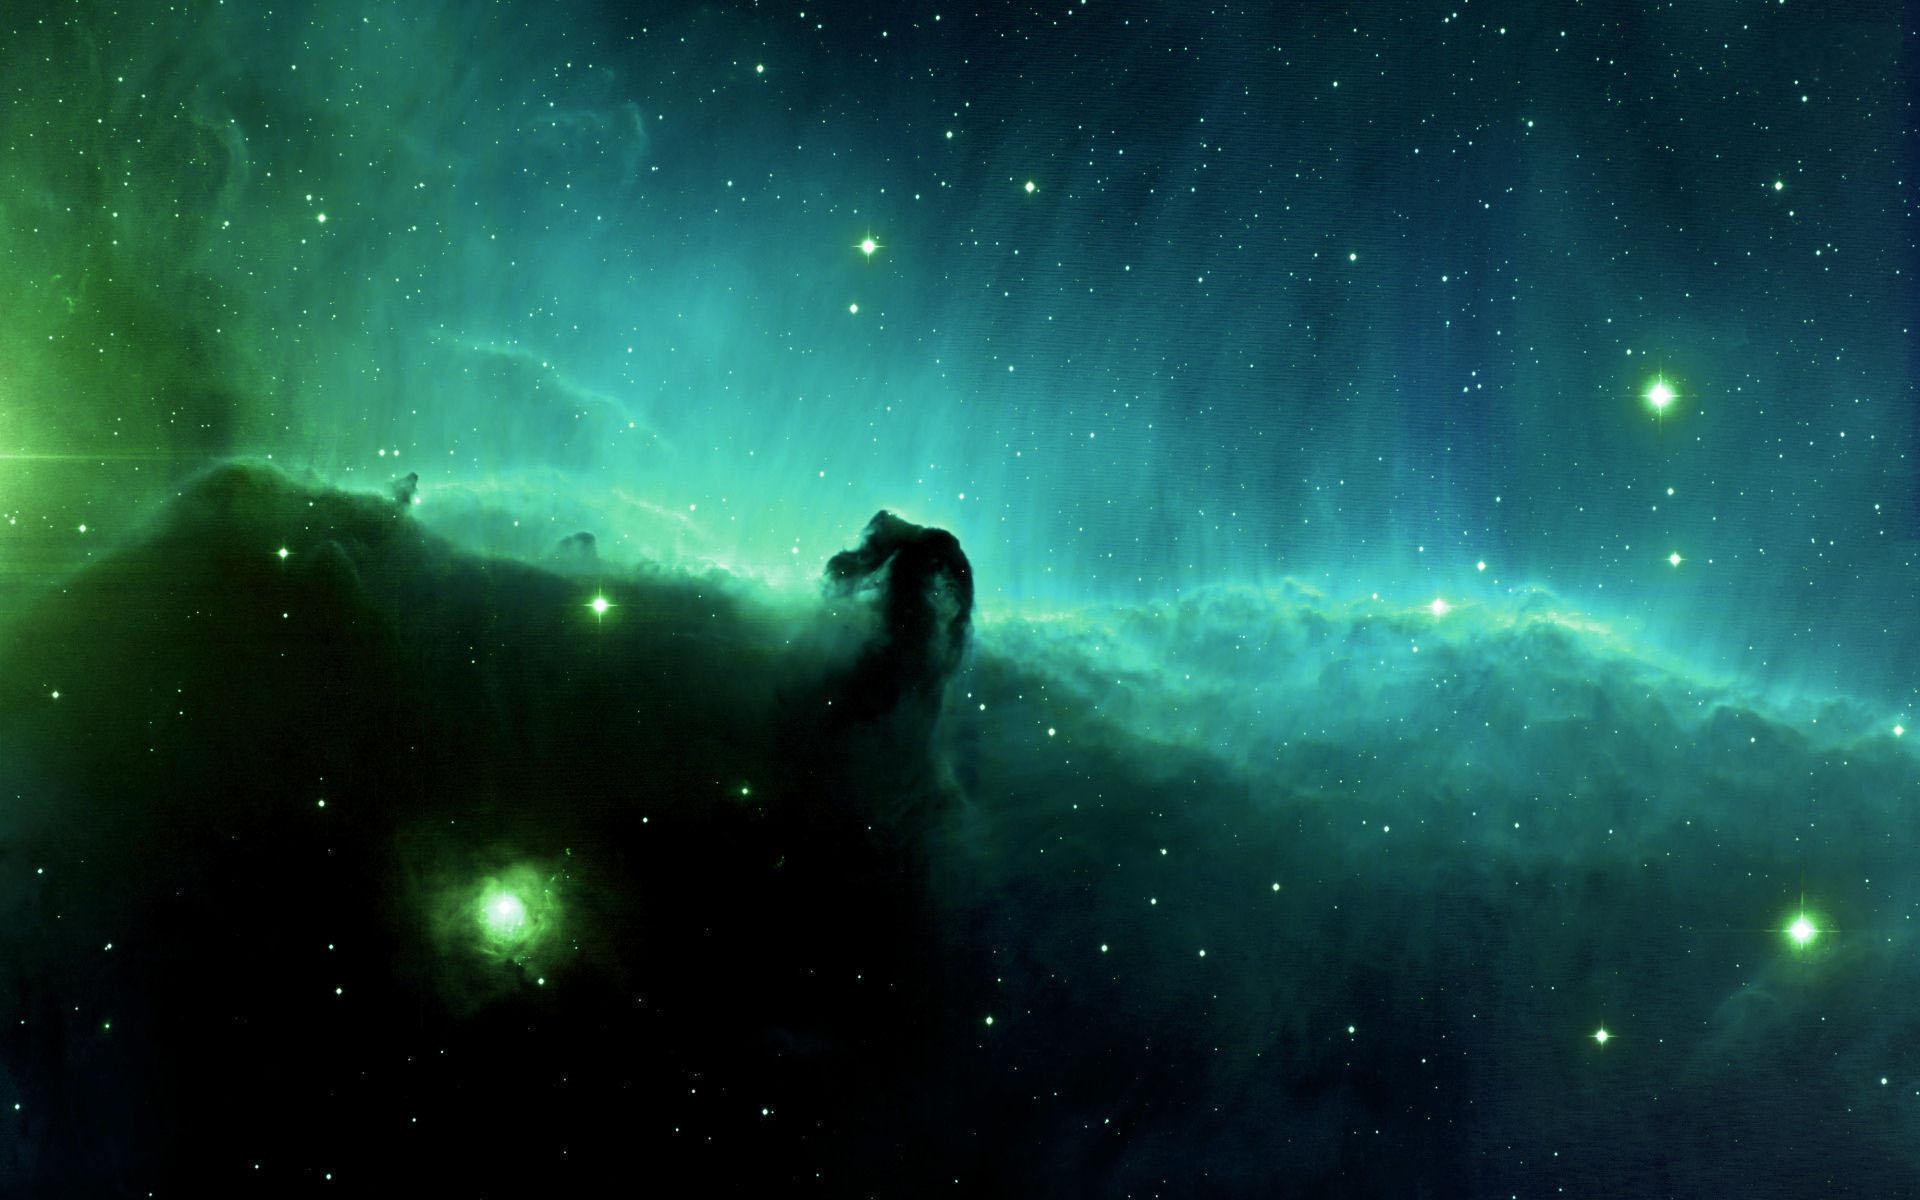 Download Wallpaper Horse Nebula - tumblr_static_3iqmzcbv3veoog4kcg0gwgow4  Best Photo Reference_42736.jpg